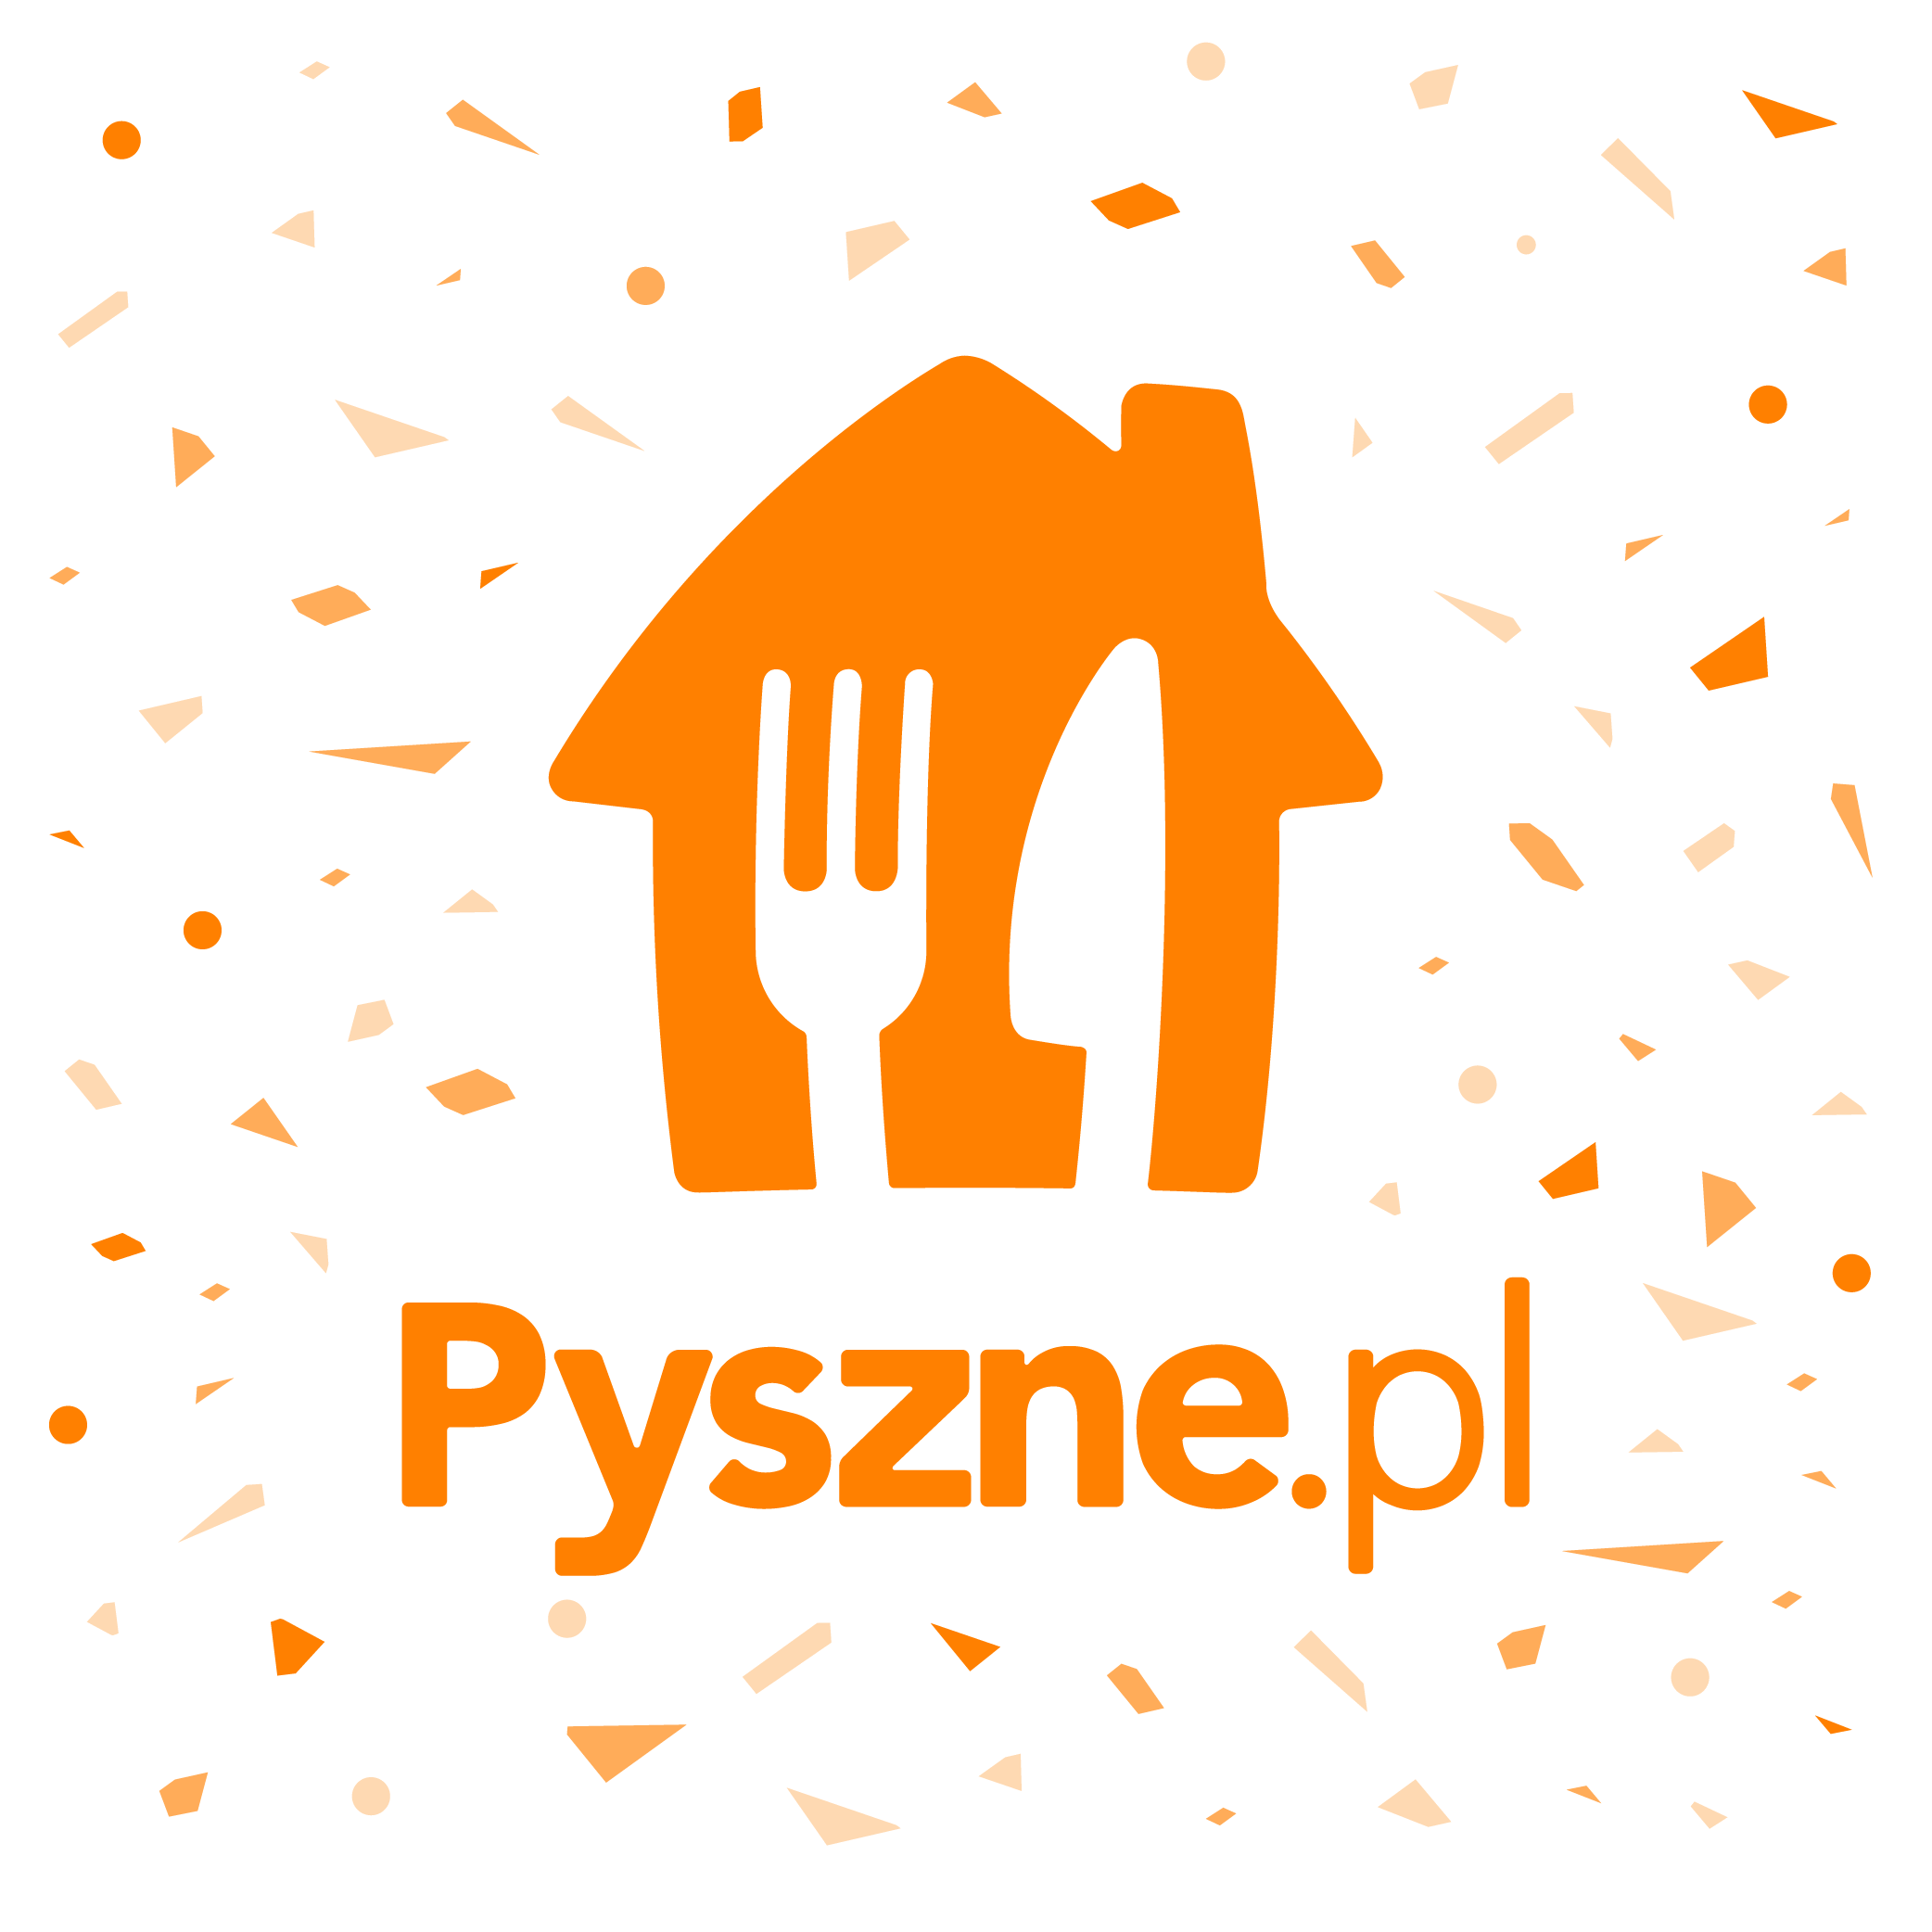 15 PLN discount on Pyszne.pl (1 per day)